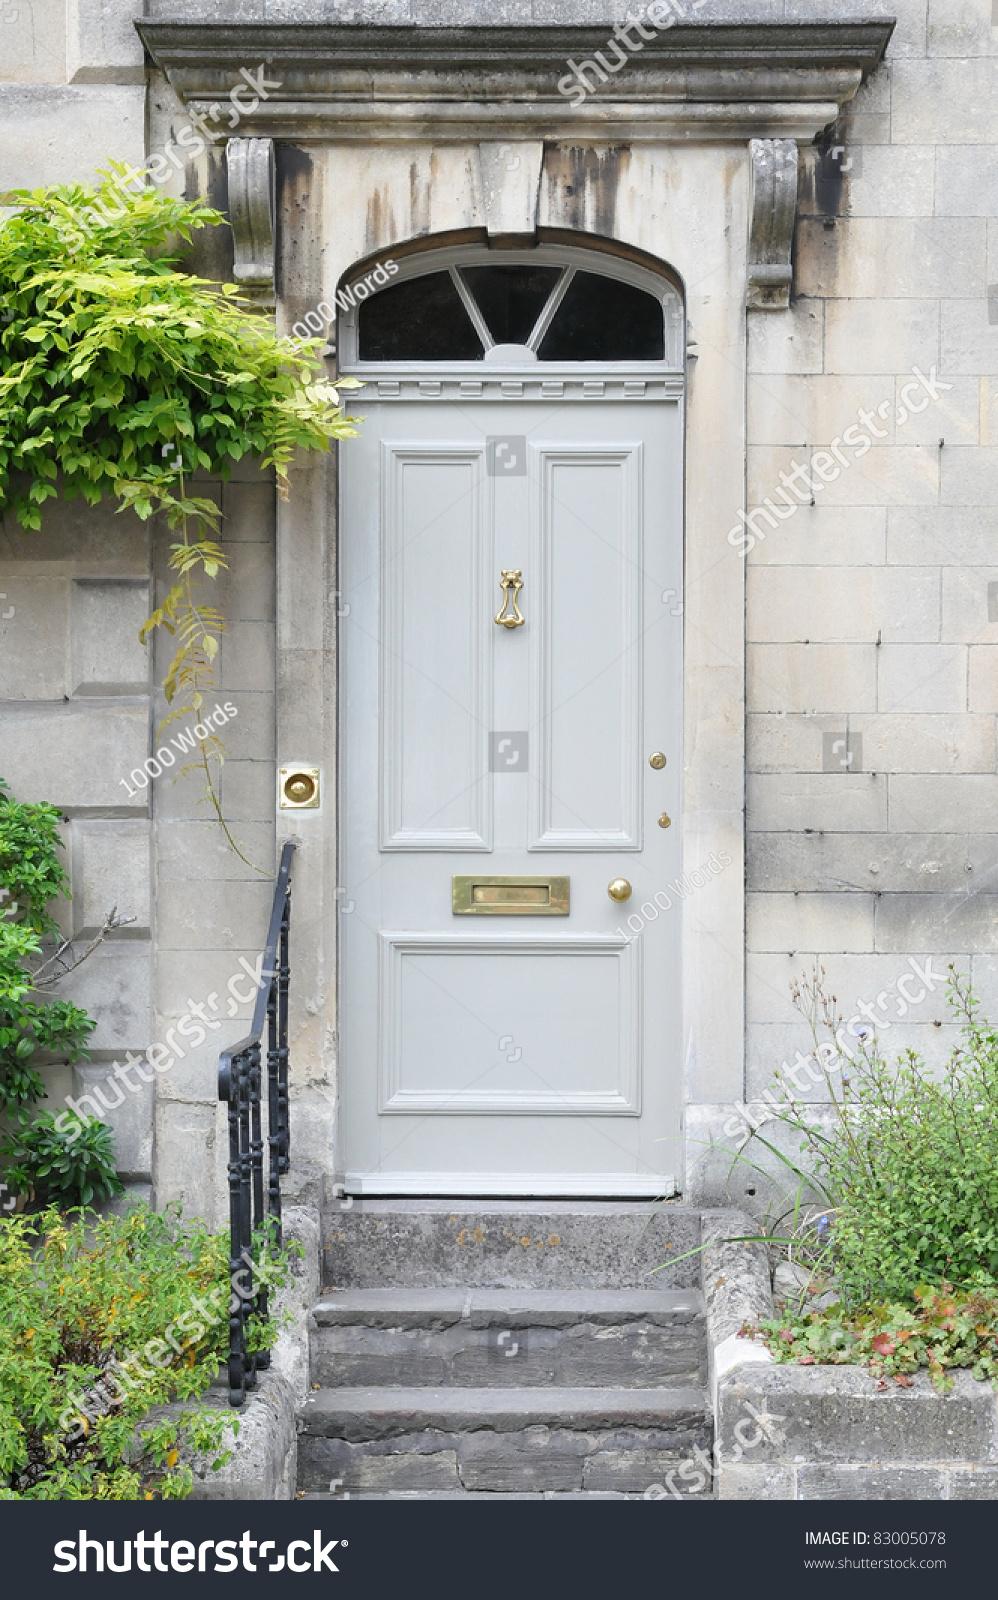 Front Door Old London Town House Stock Photo 83005078 - Shutterstock